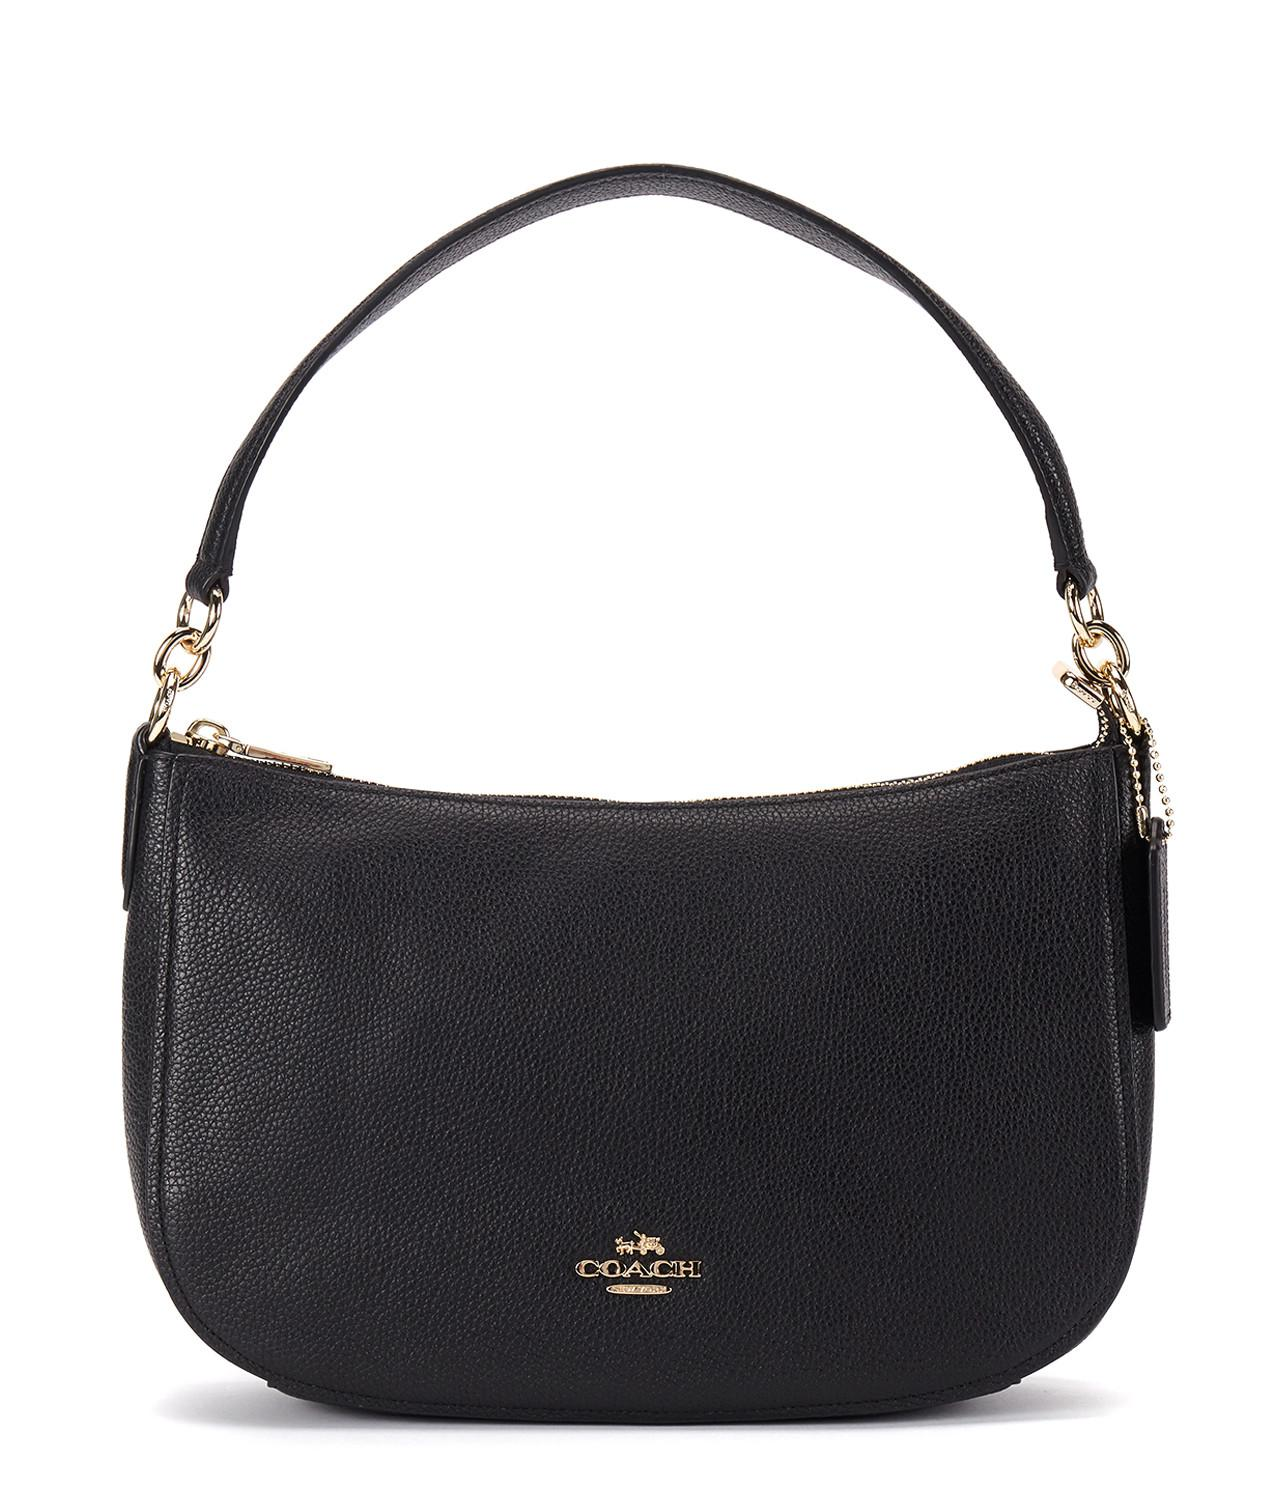 COACH - Black Chelsy Graned Leather - Lyst. View fullscreen 95b5bab299b79